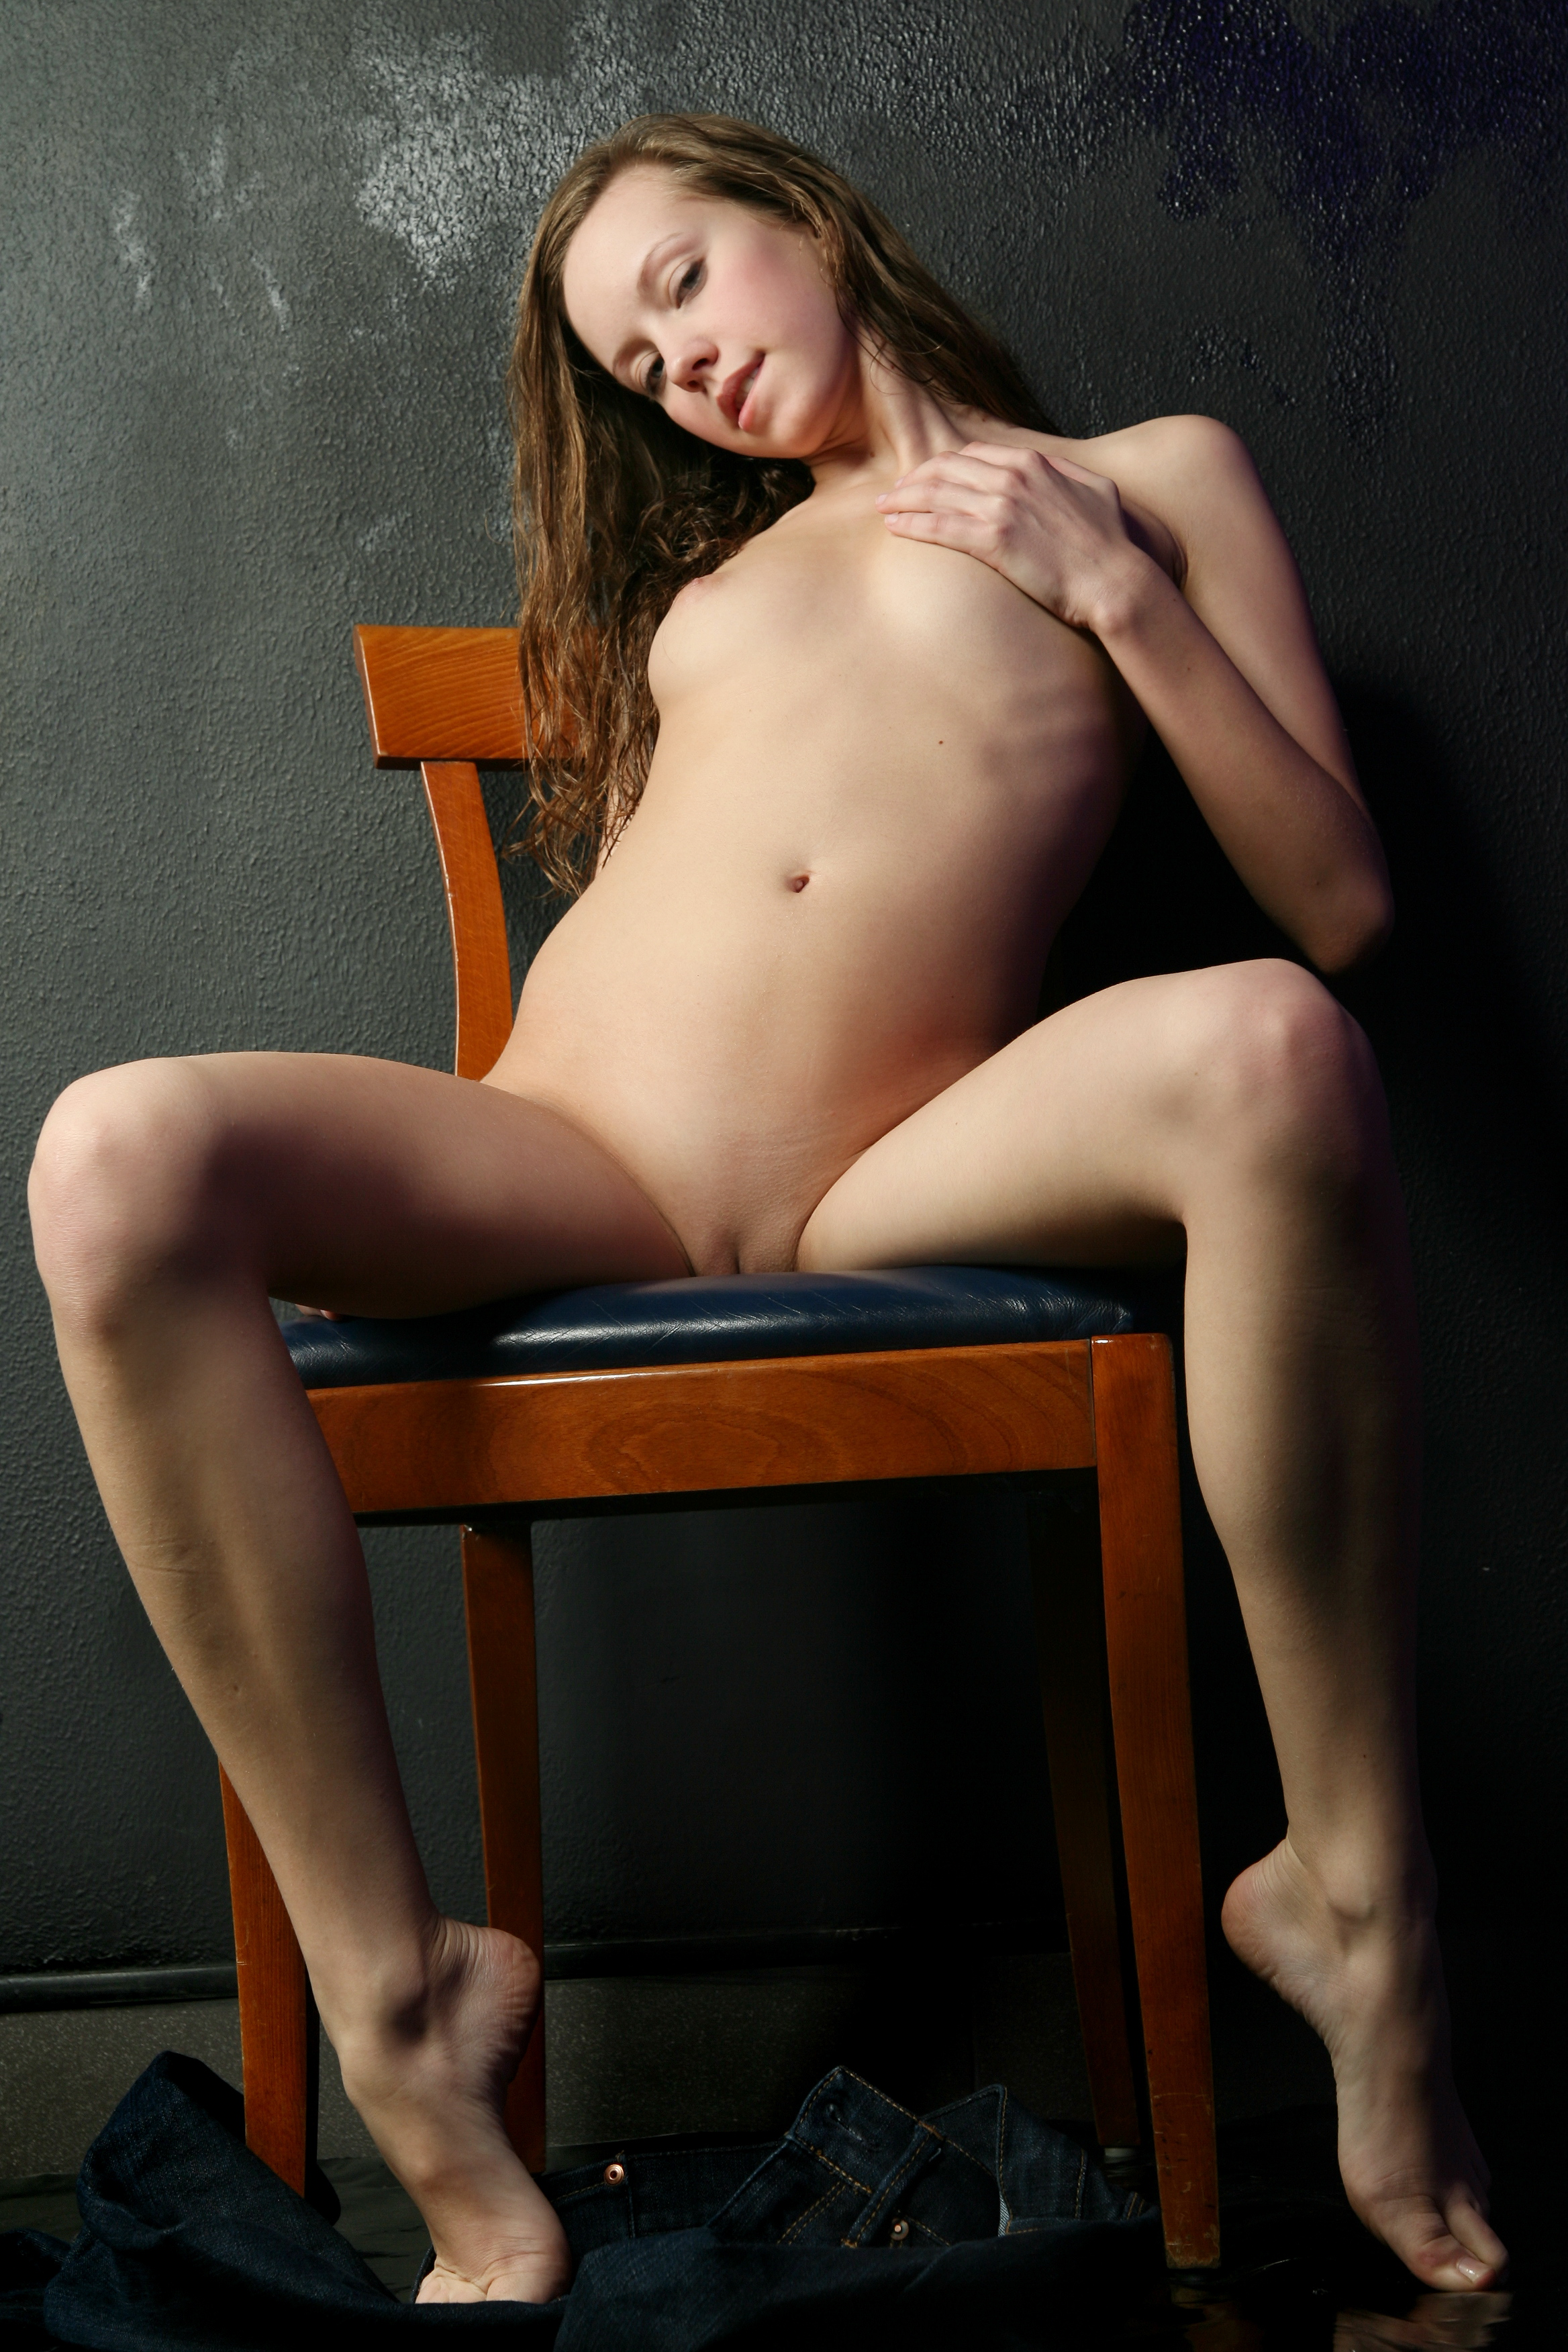 0141 M3tM0d31s - Natasha - Bocca.5,